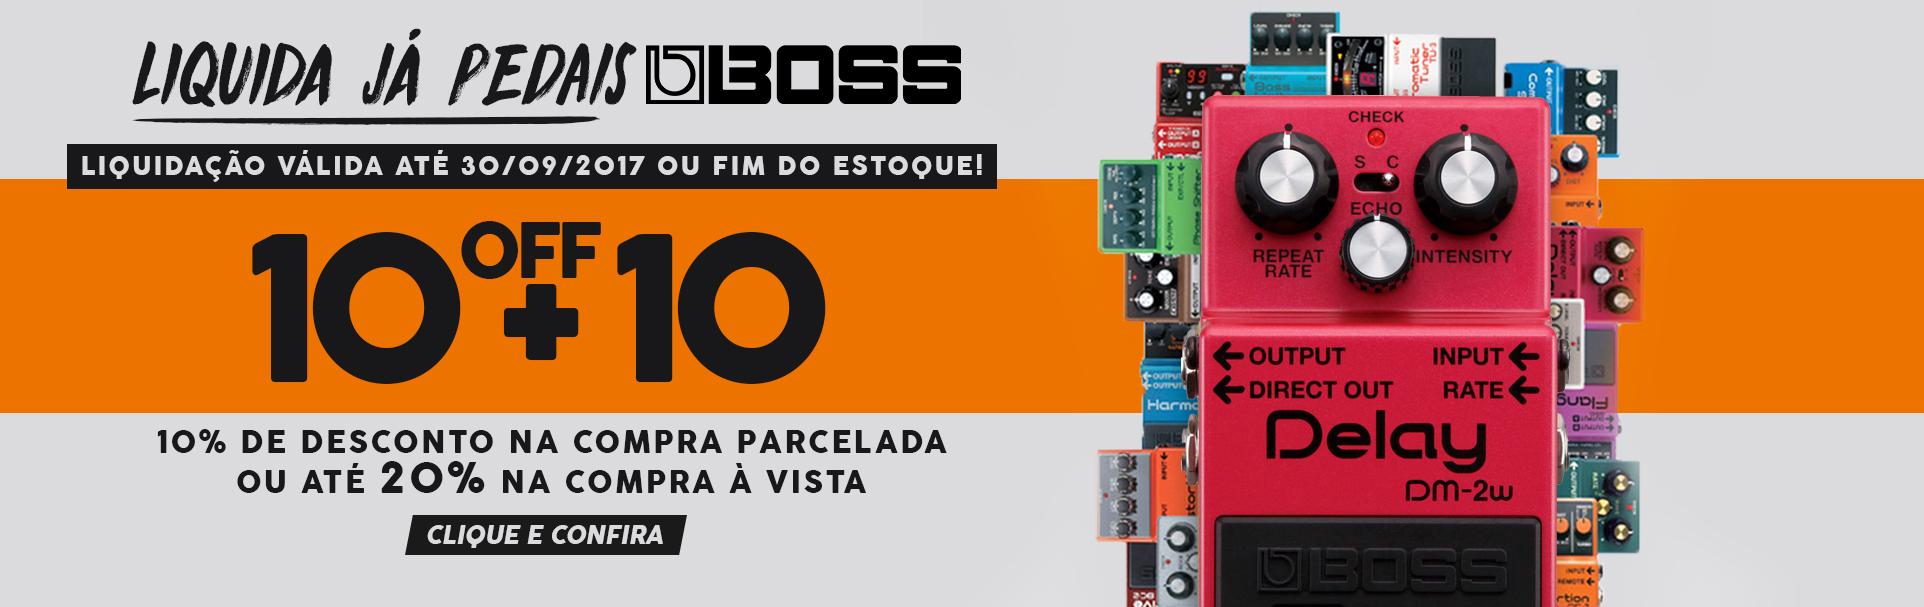 Boss 10+10